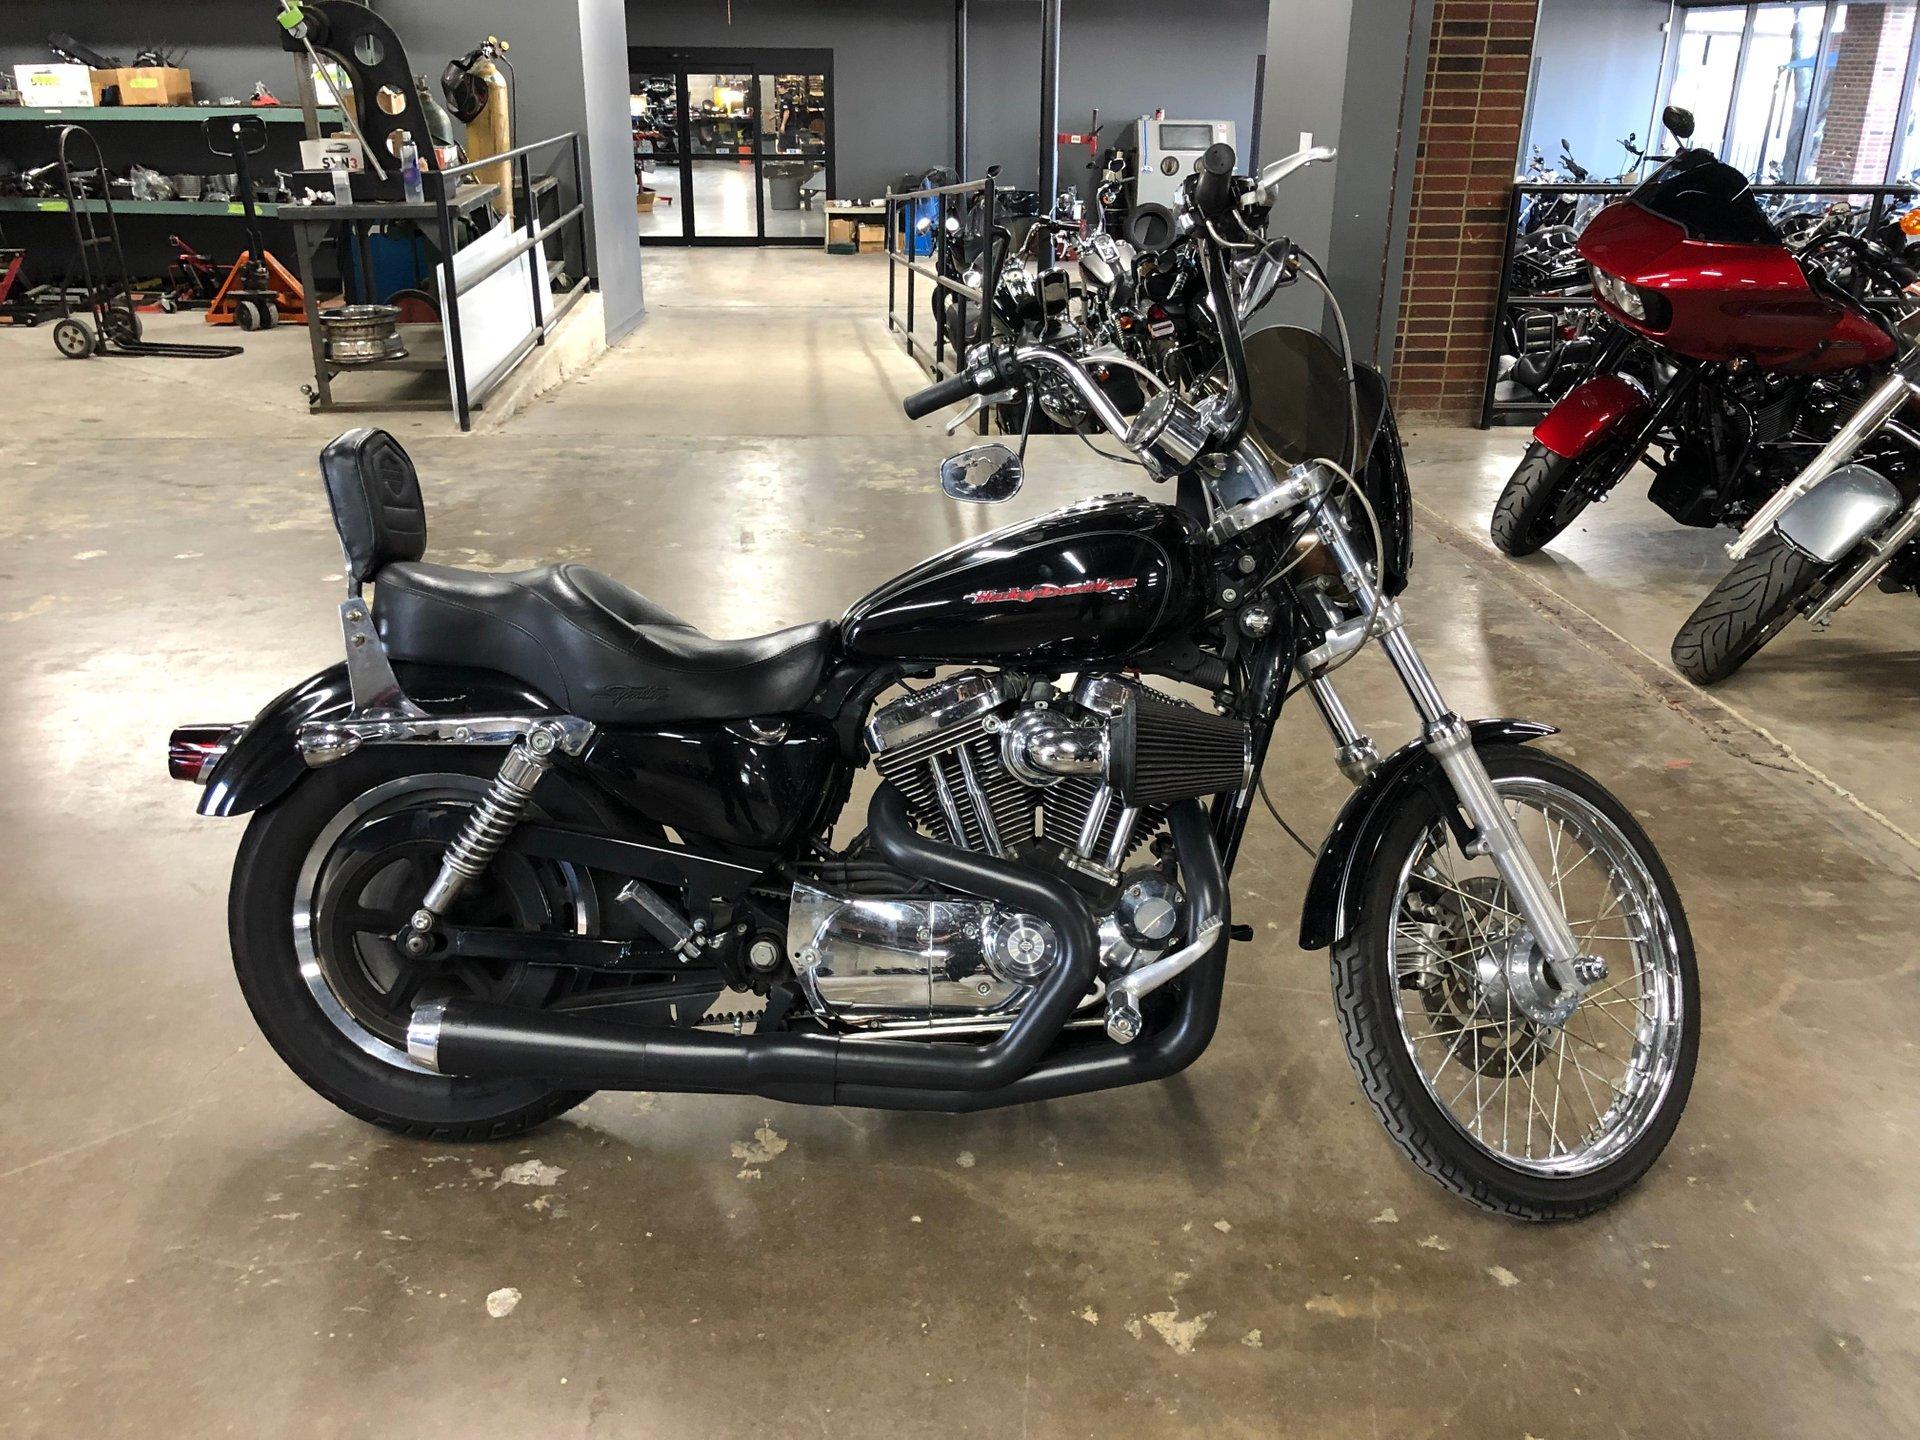 2007 Harley Davidson Sportster 1200 American Motorcycle Trading Company Used Harley Davidson Motorcycles